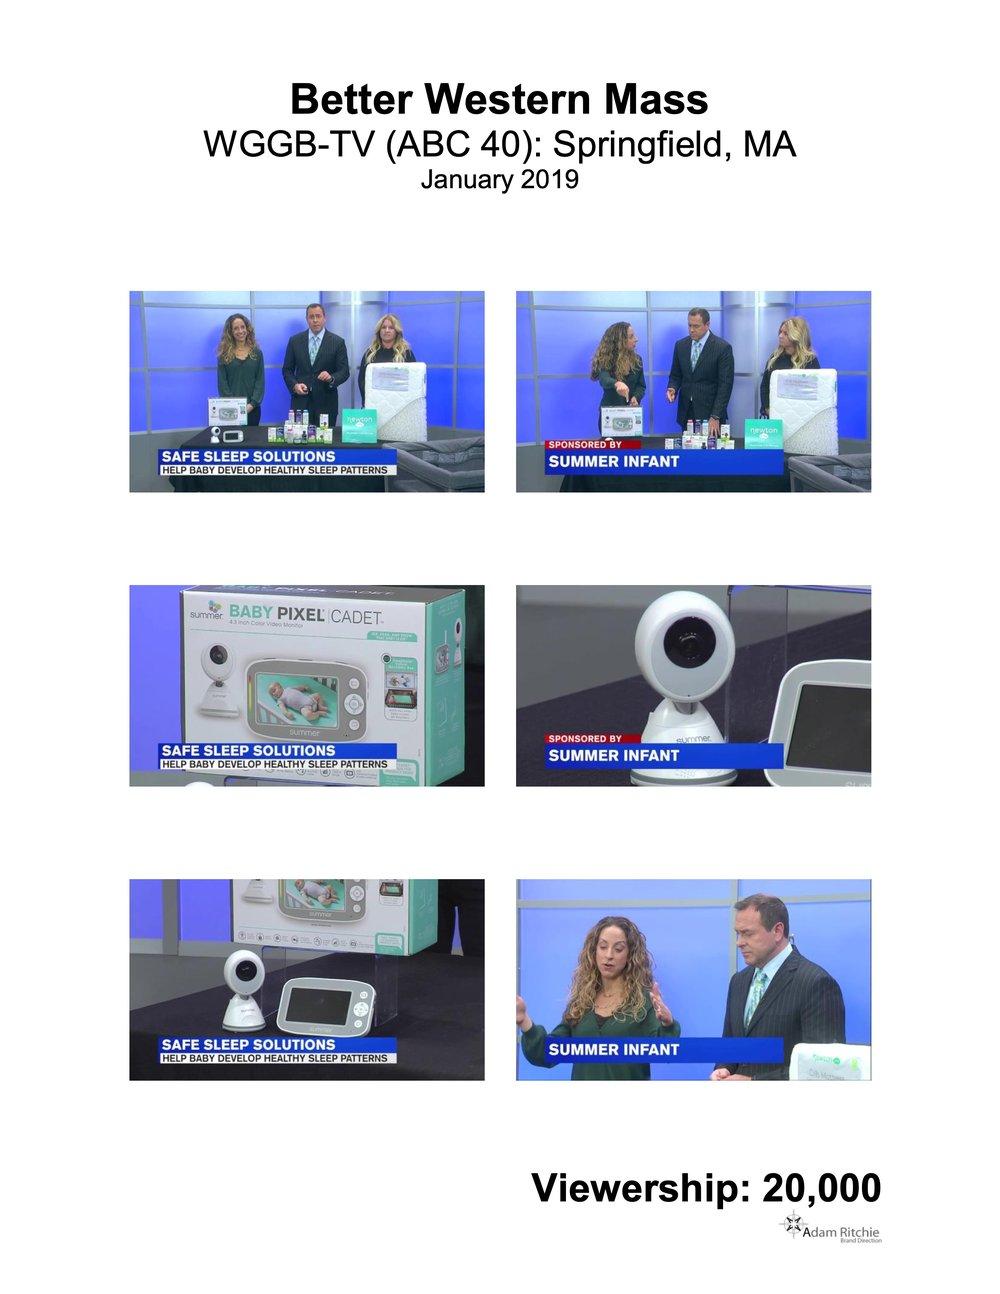 2019.01.21_WGGB-TV (ABC 40), WSHM-TV (CBS 3) Springfield, Better Western Mass_Summer Infant Baby Pixel Cadet Video Monitor.jpeg